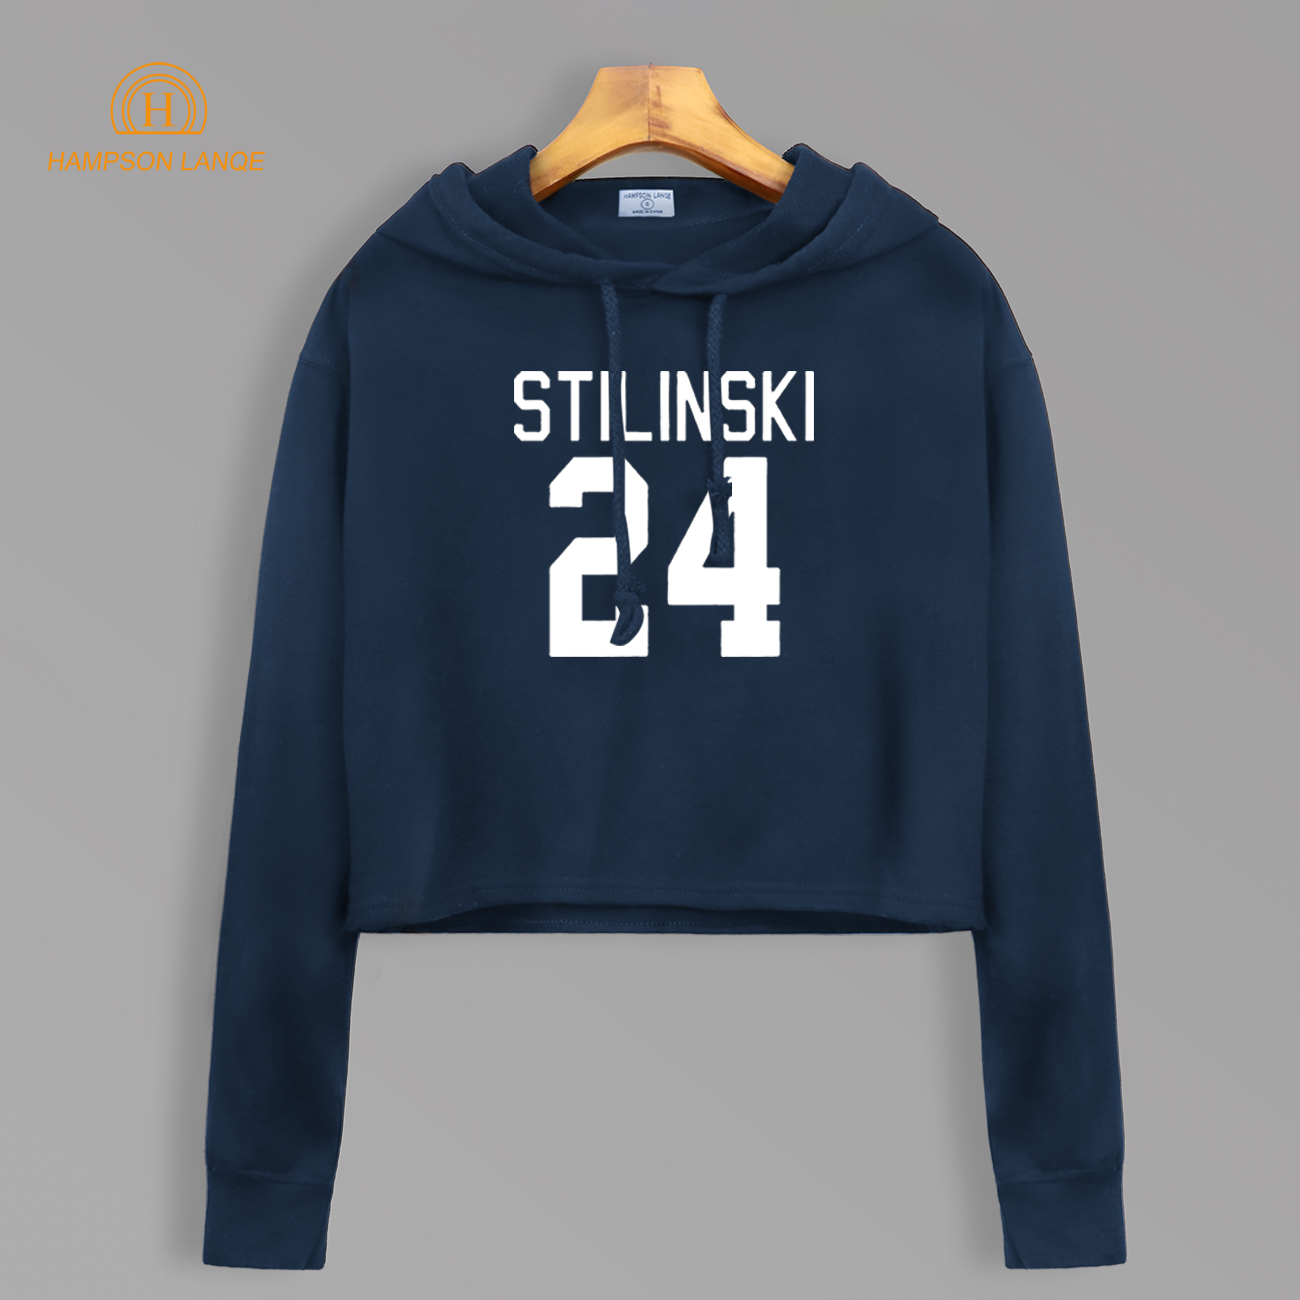 Teen Wolf Stilinski 24 Short Style Sweatshirt Autumn 2020 TV Show Women Kawaii Cotton Cropped Hoodie Sexy Pullovers For Fans